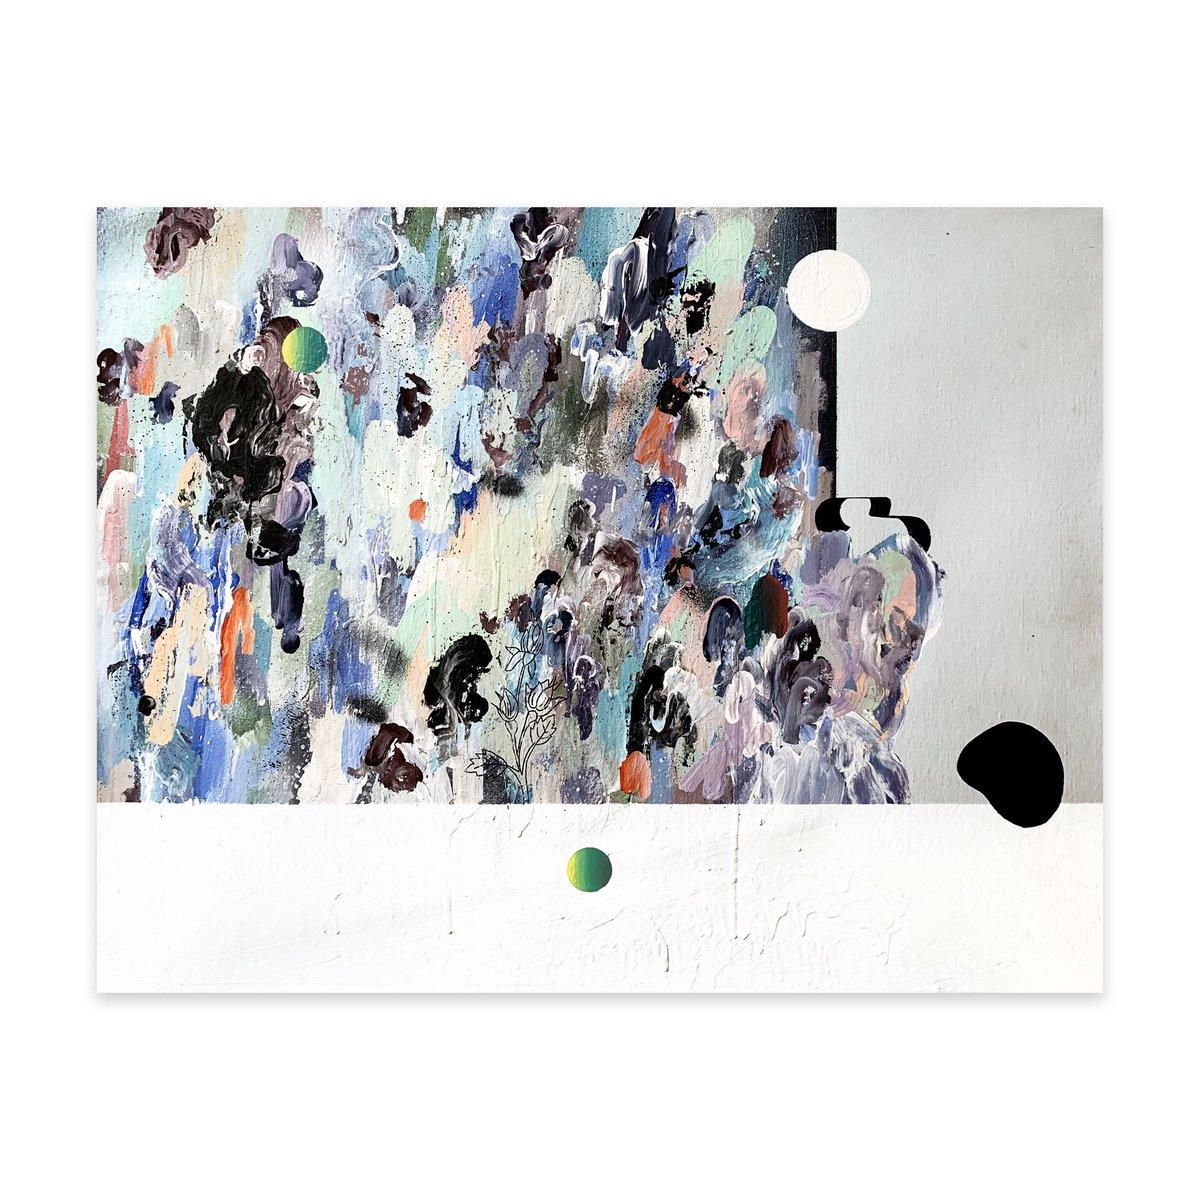 🔥🔥🔥    #art #artist #artwork #contemporaryart #artistoninstagram #artstudio #artsy #artforsale #painting #abstract #abstractpainting #drawing #illustration #color #flowers #selfisolation #quarantine #quarantineart